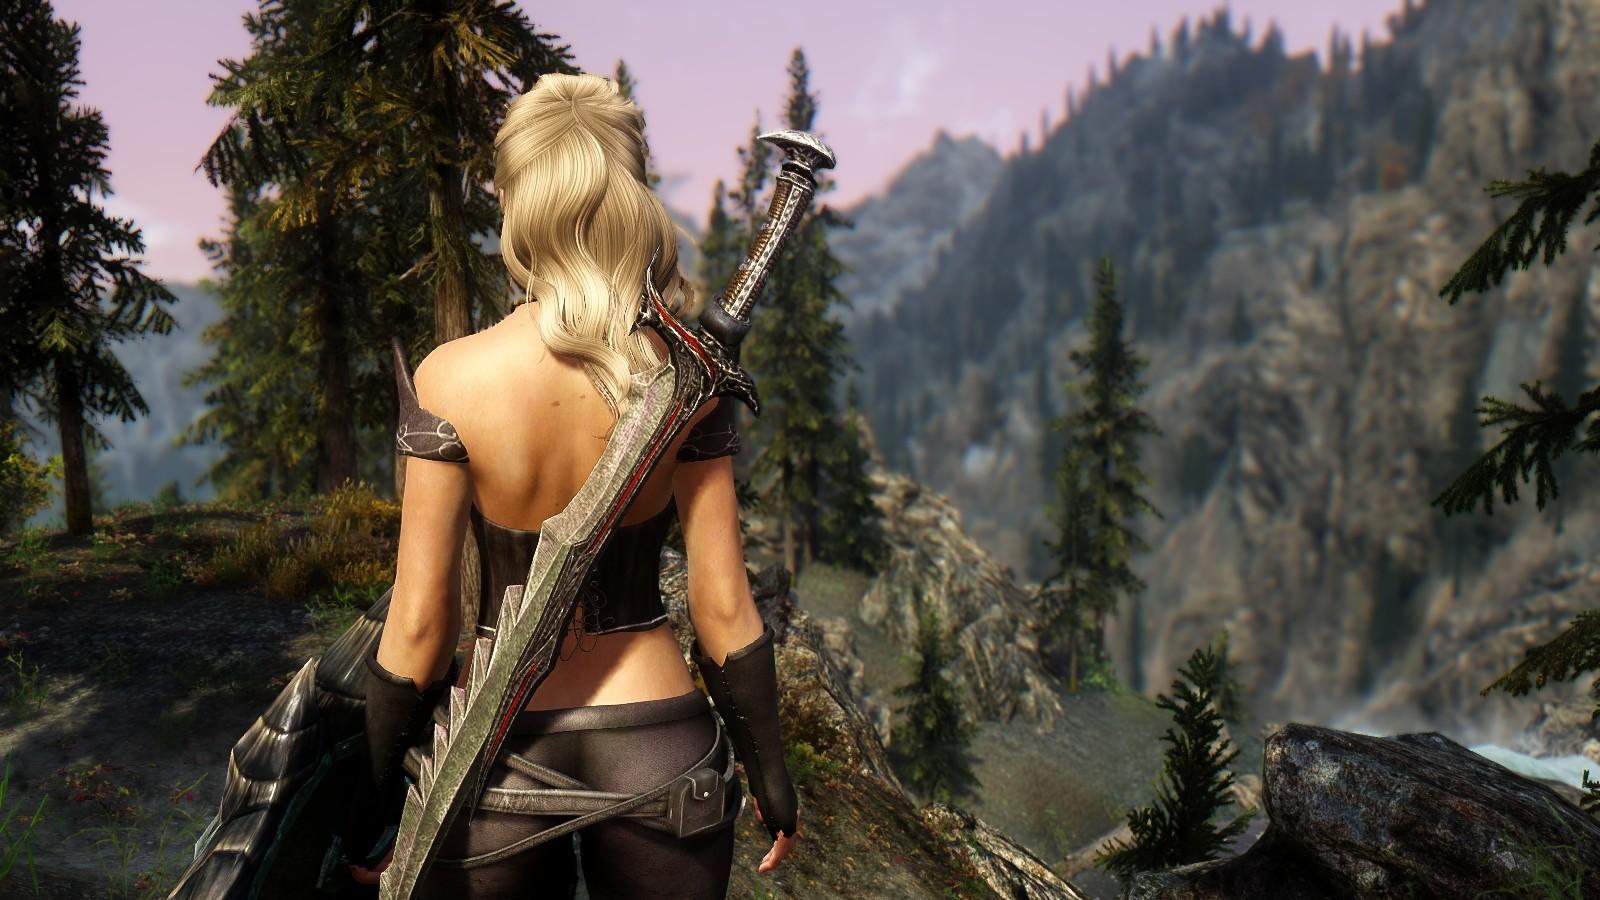 Morrowind shemale nudes scene